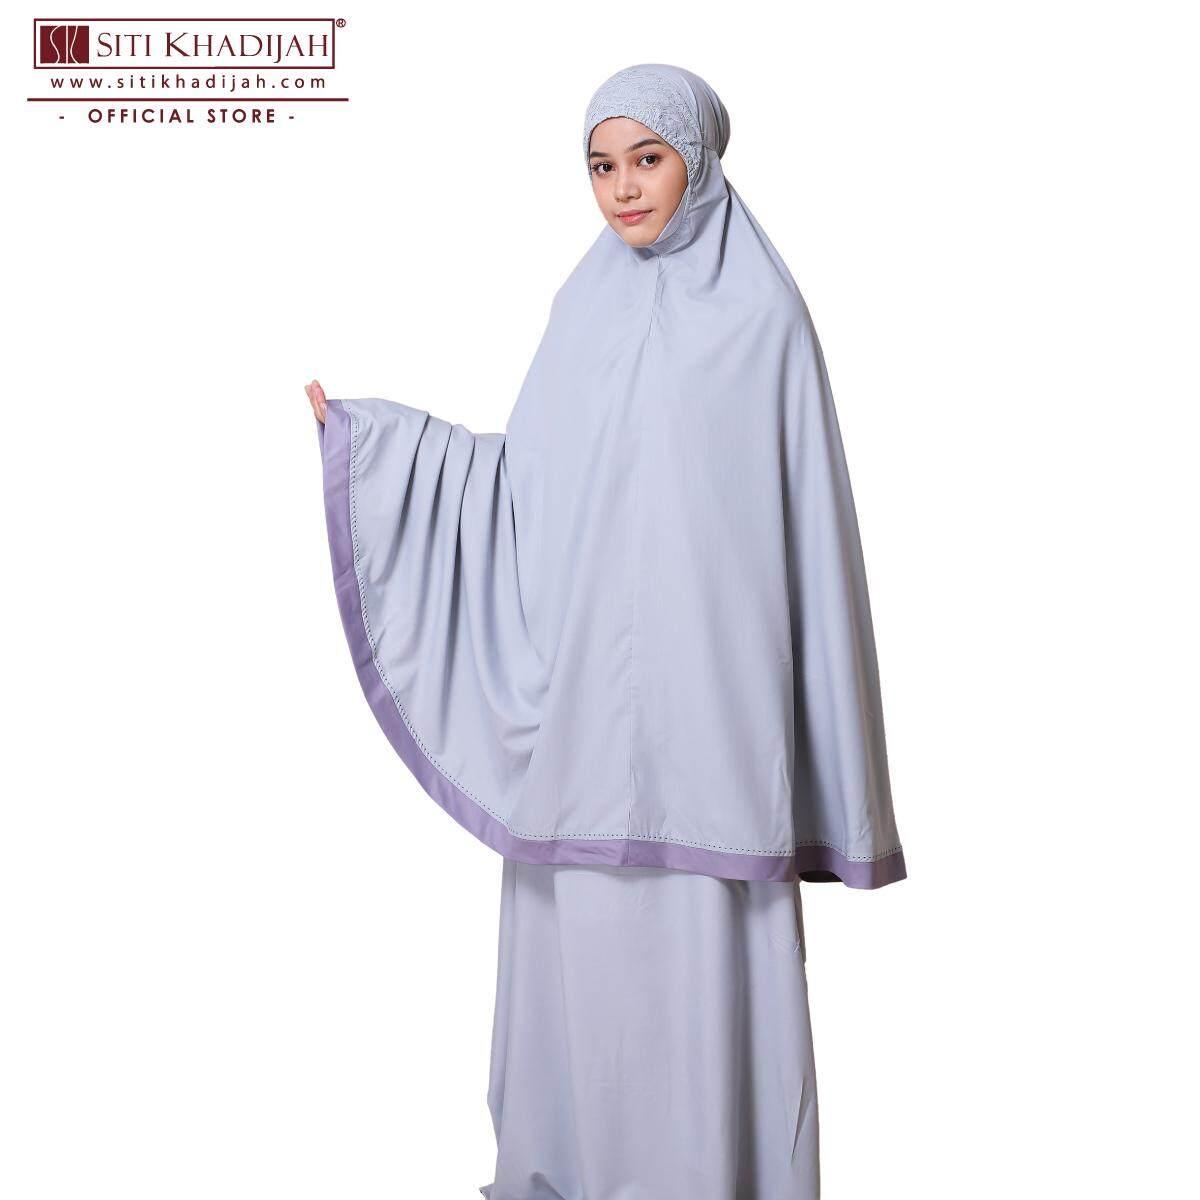 Telekung Siti Khadijah The Prayer Outfit (TPO) 4.0 (Grey)